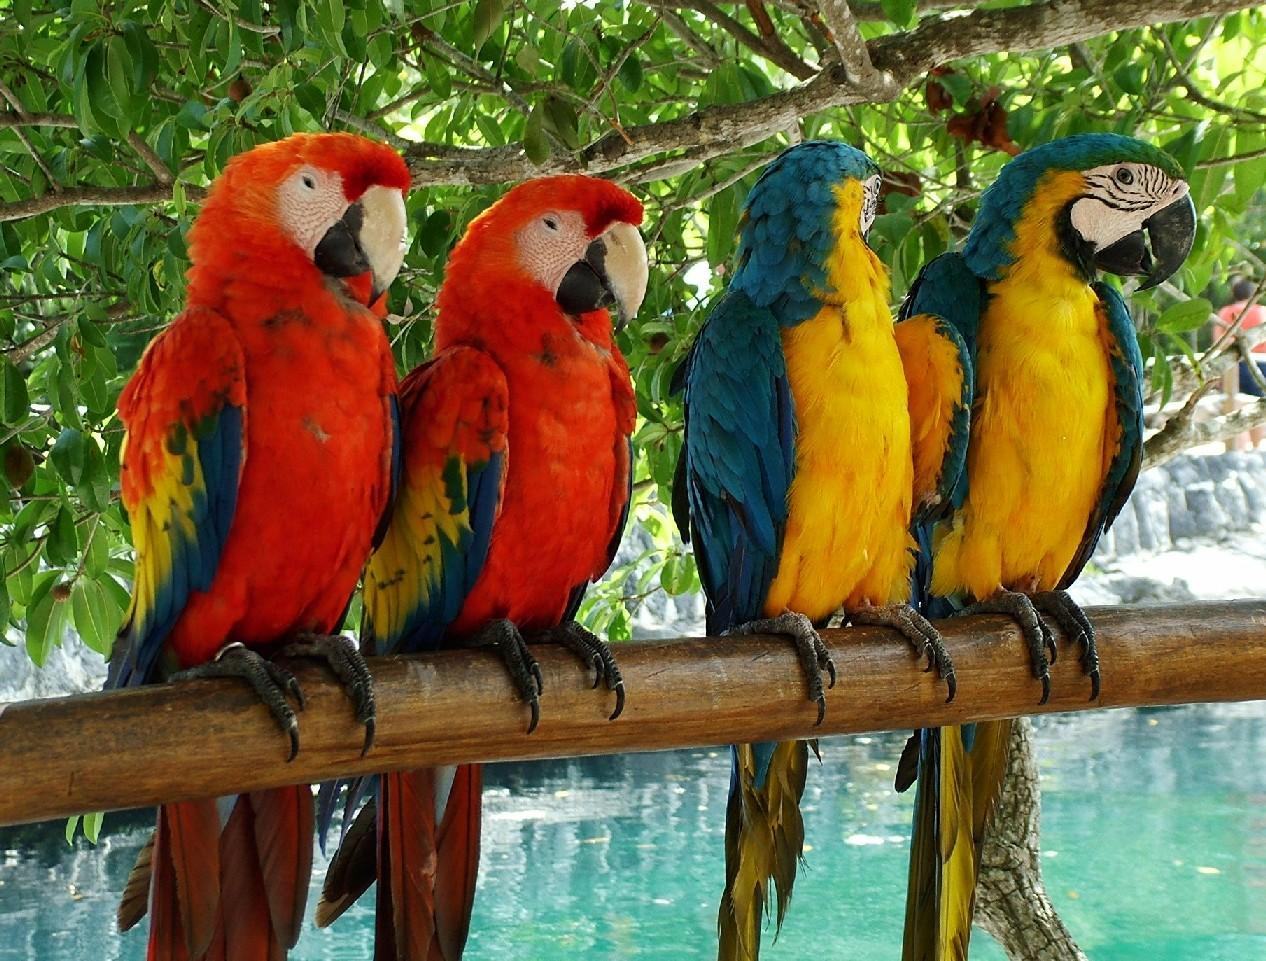 tropical bird wallpaper for walls - photo #12